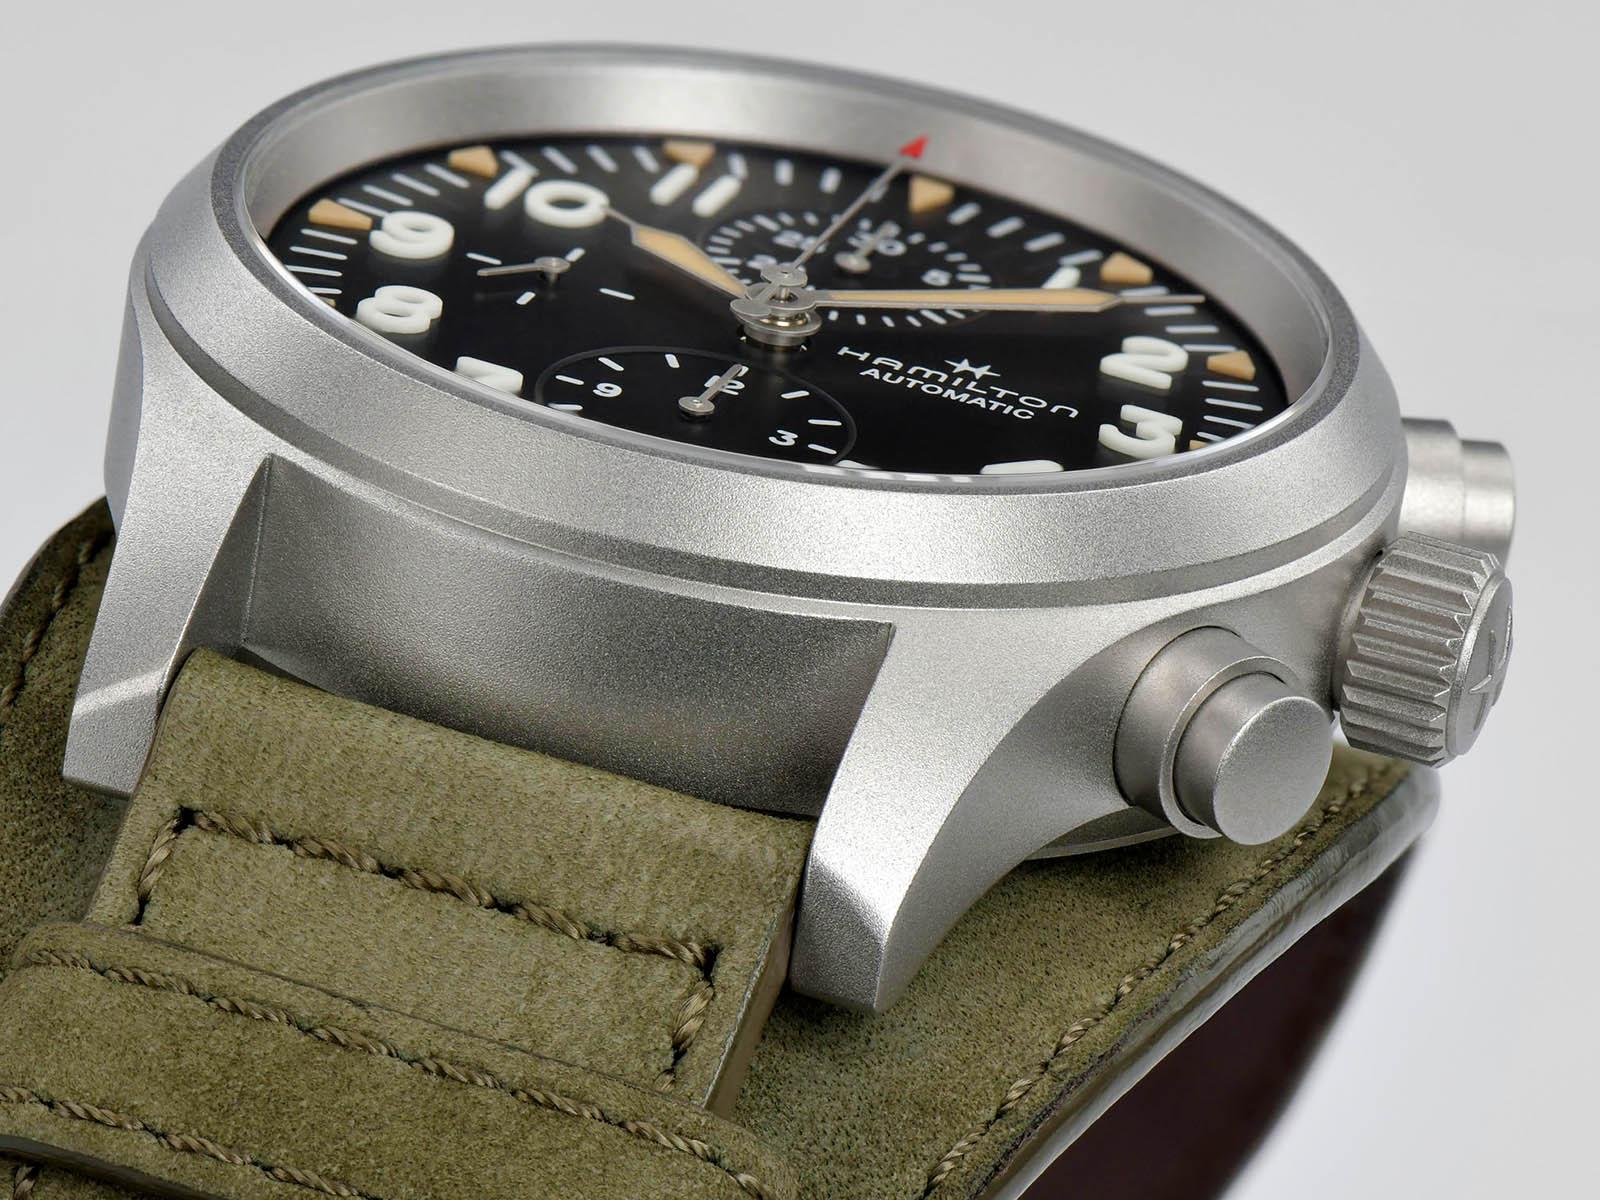 h71706830-hamilton-khaki-field-automatic-chronograph-5.jpg